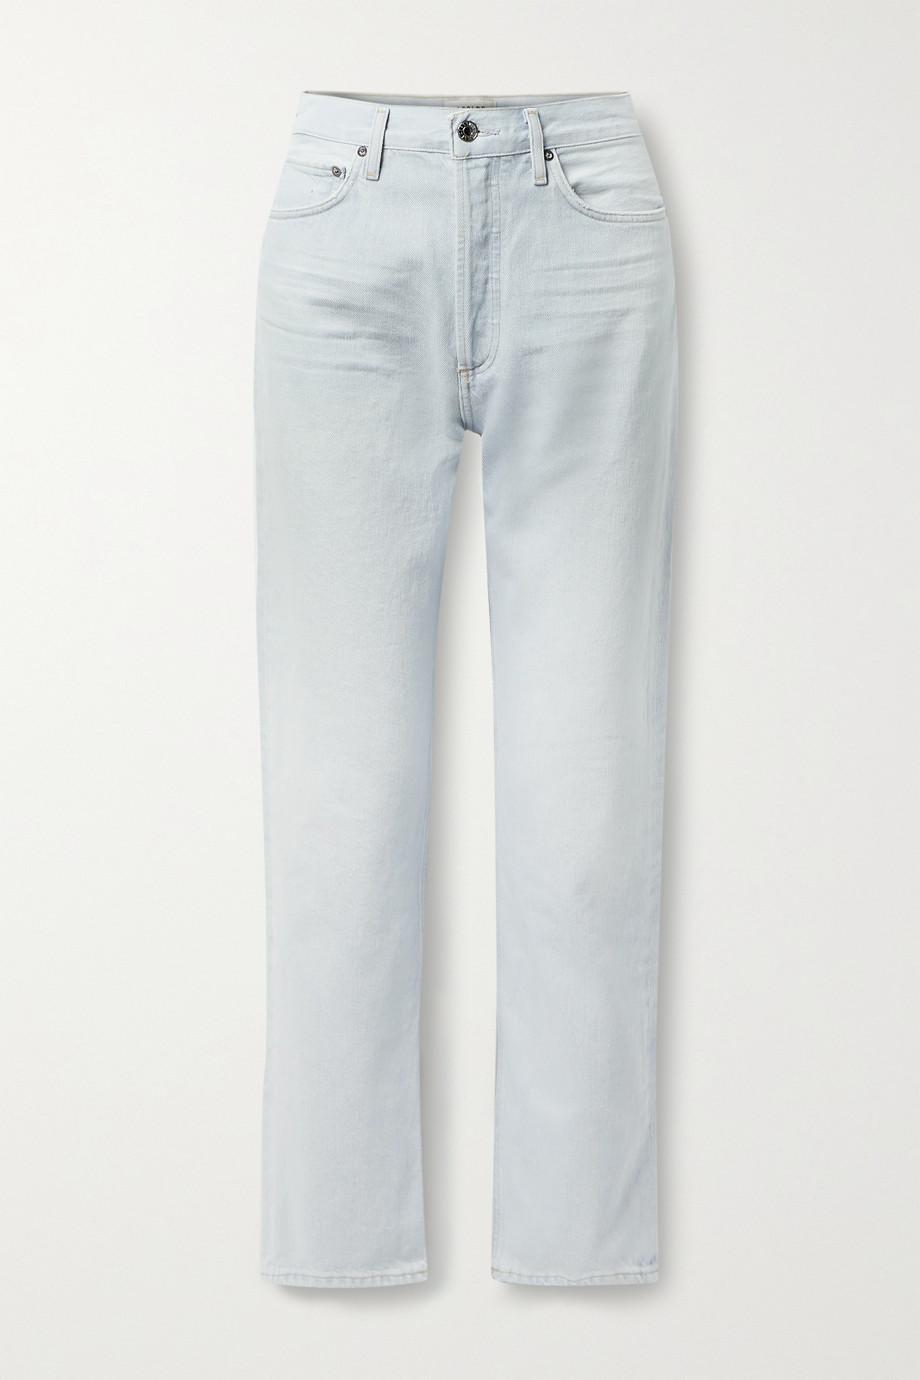 AGOLDE + NET SUSTAIN '90s Pinch Waist high-rise straight-leg jeans